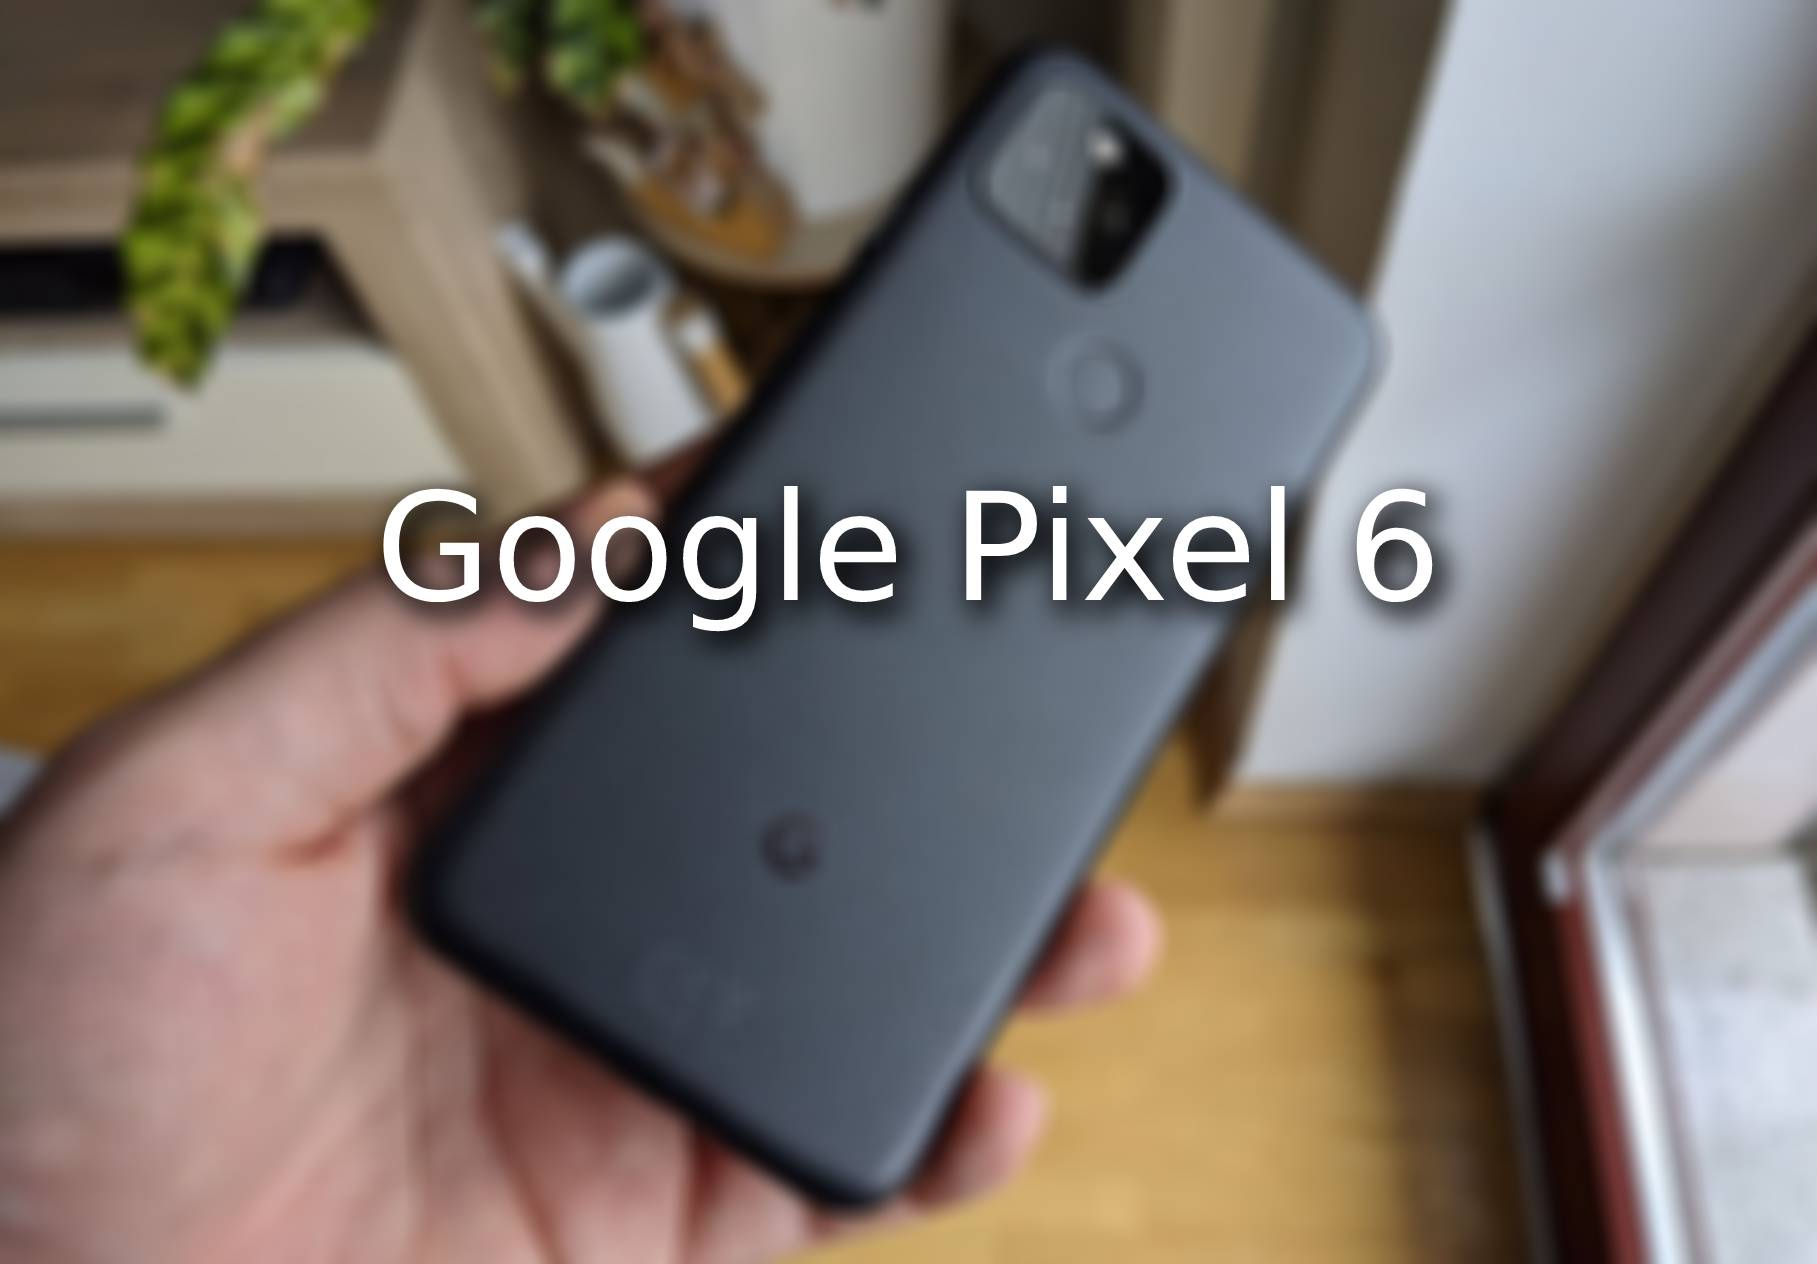 Pixel 5a betroffen, das Pixel 6 vielleicht nicht: Umgeht Google den Chipmangel?